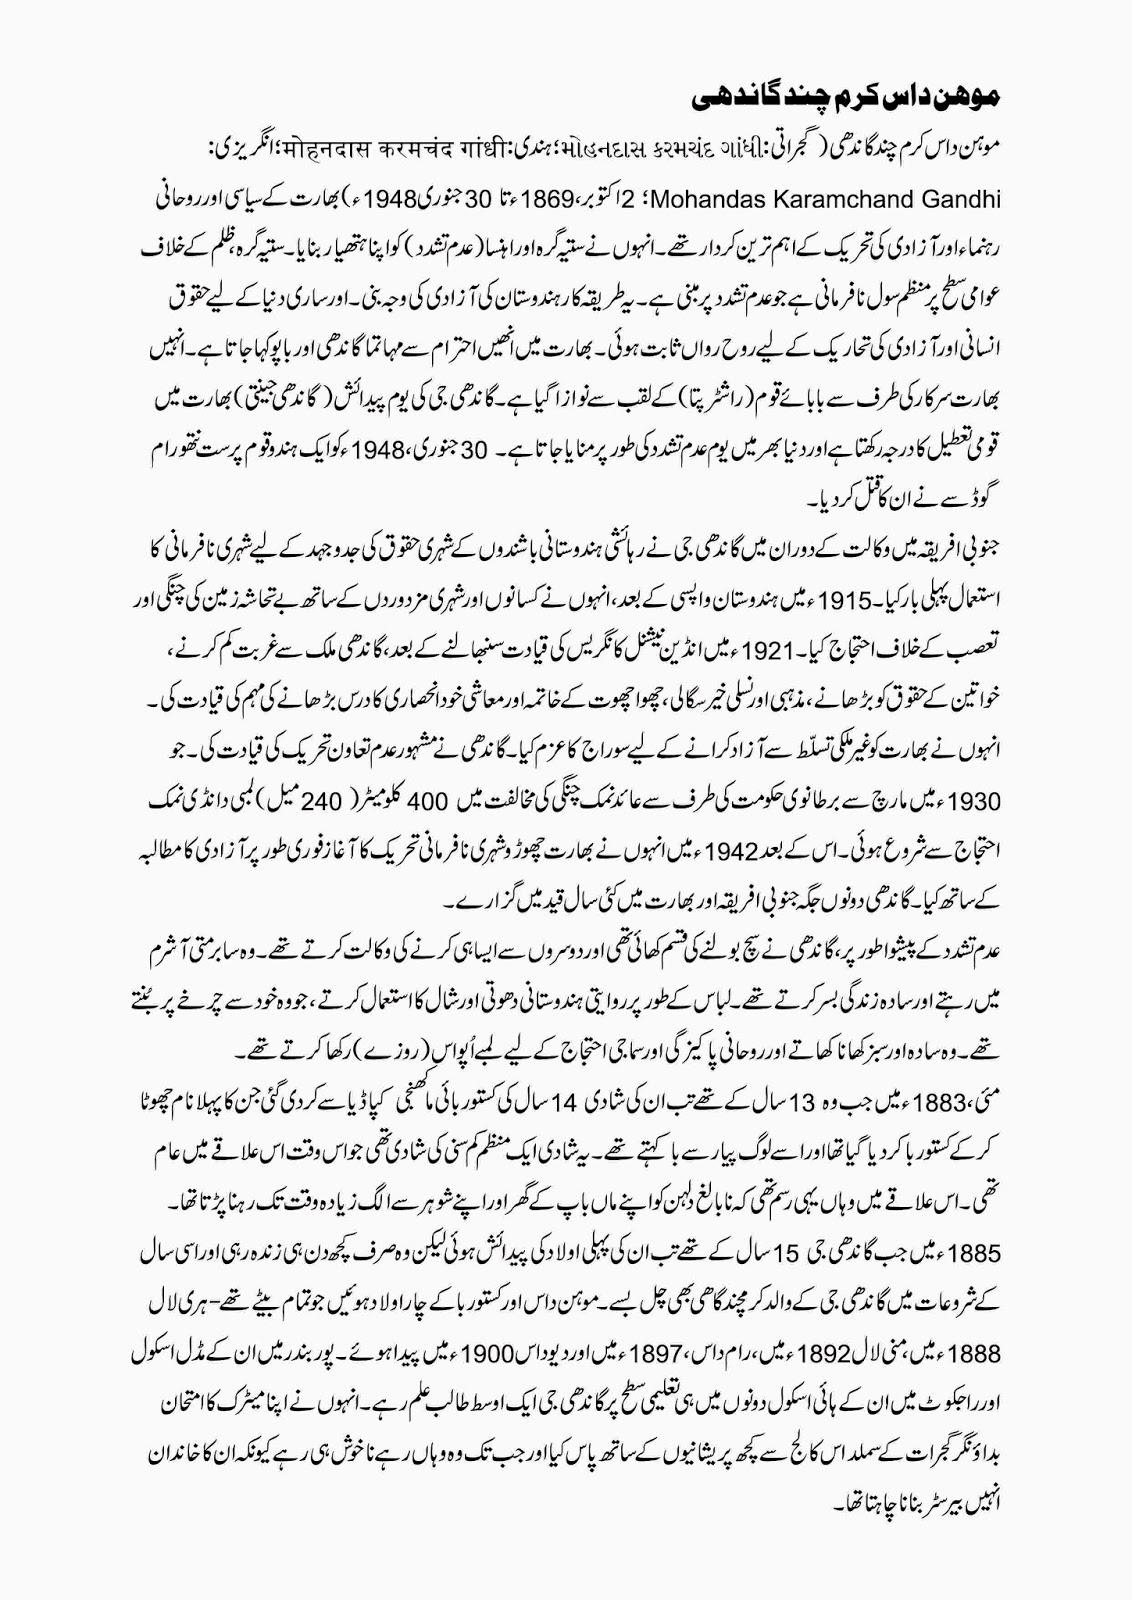 001 Mahatma Gandhi Essay In Urdu Essay2bmahatma2bgandhi2burdu2b1 Imposing Language Jayanti Speech Full